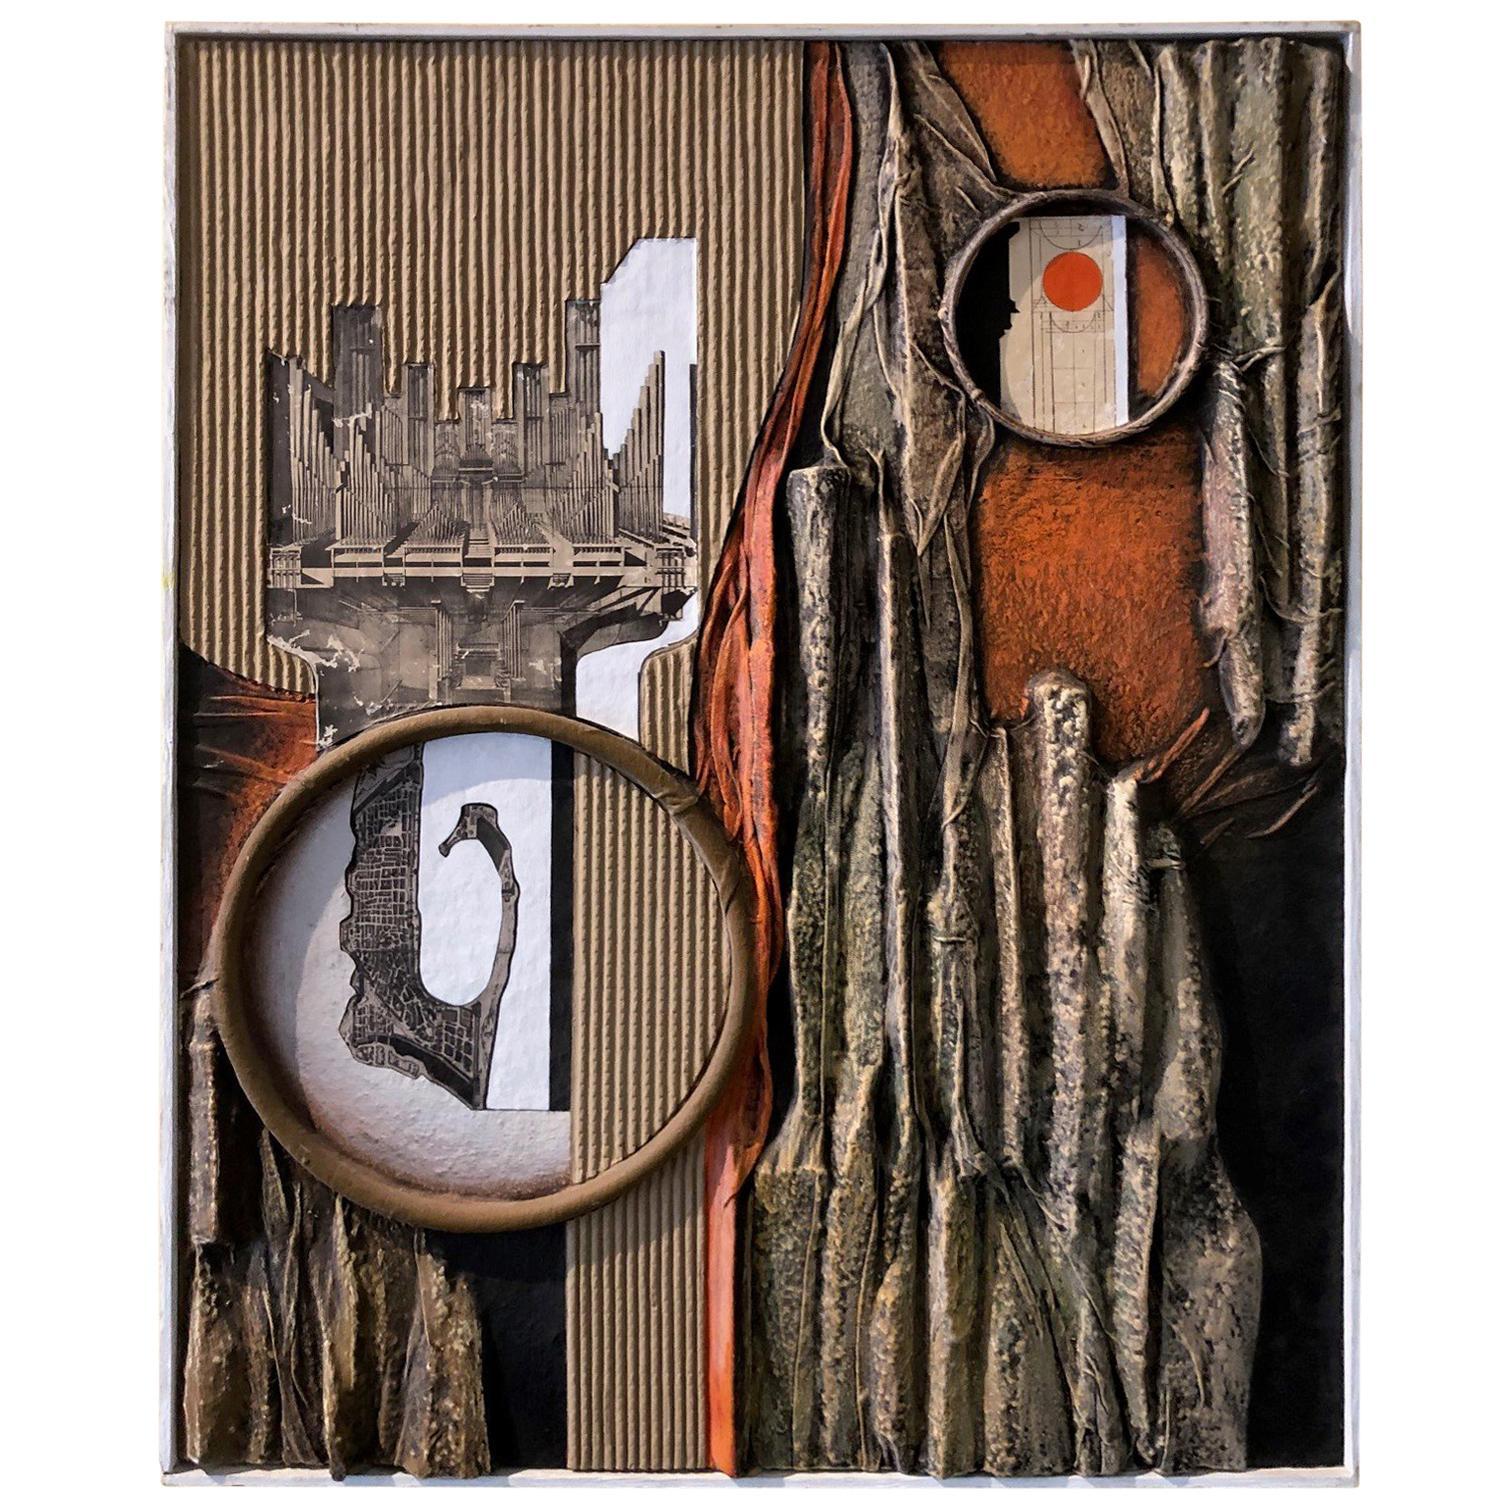 Mid-Century Modern Mixed-Media Three Dimensional Abstract by Angela Kosta